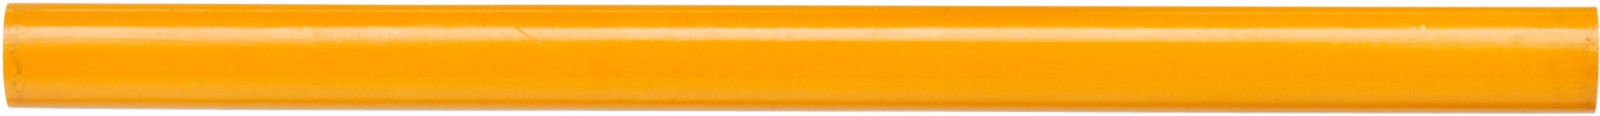 Wooden carpenter's pencil - Yellow